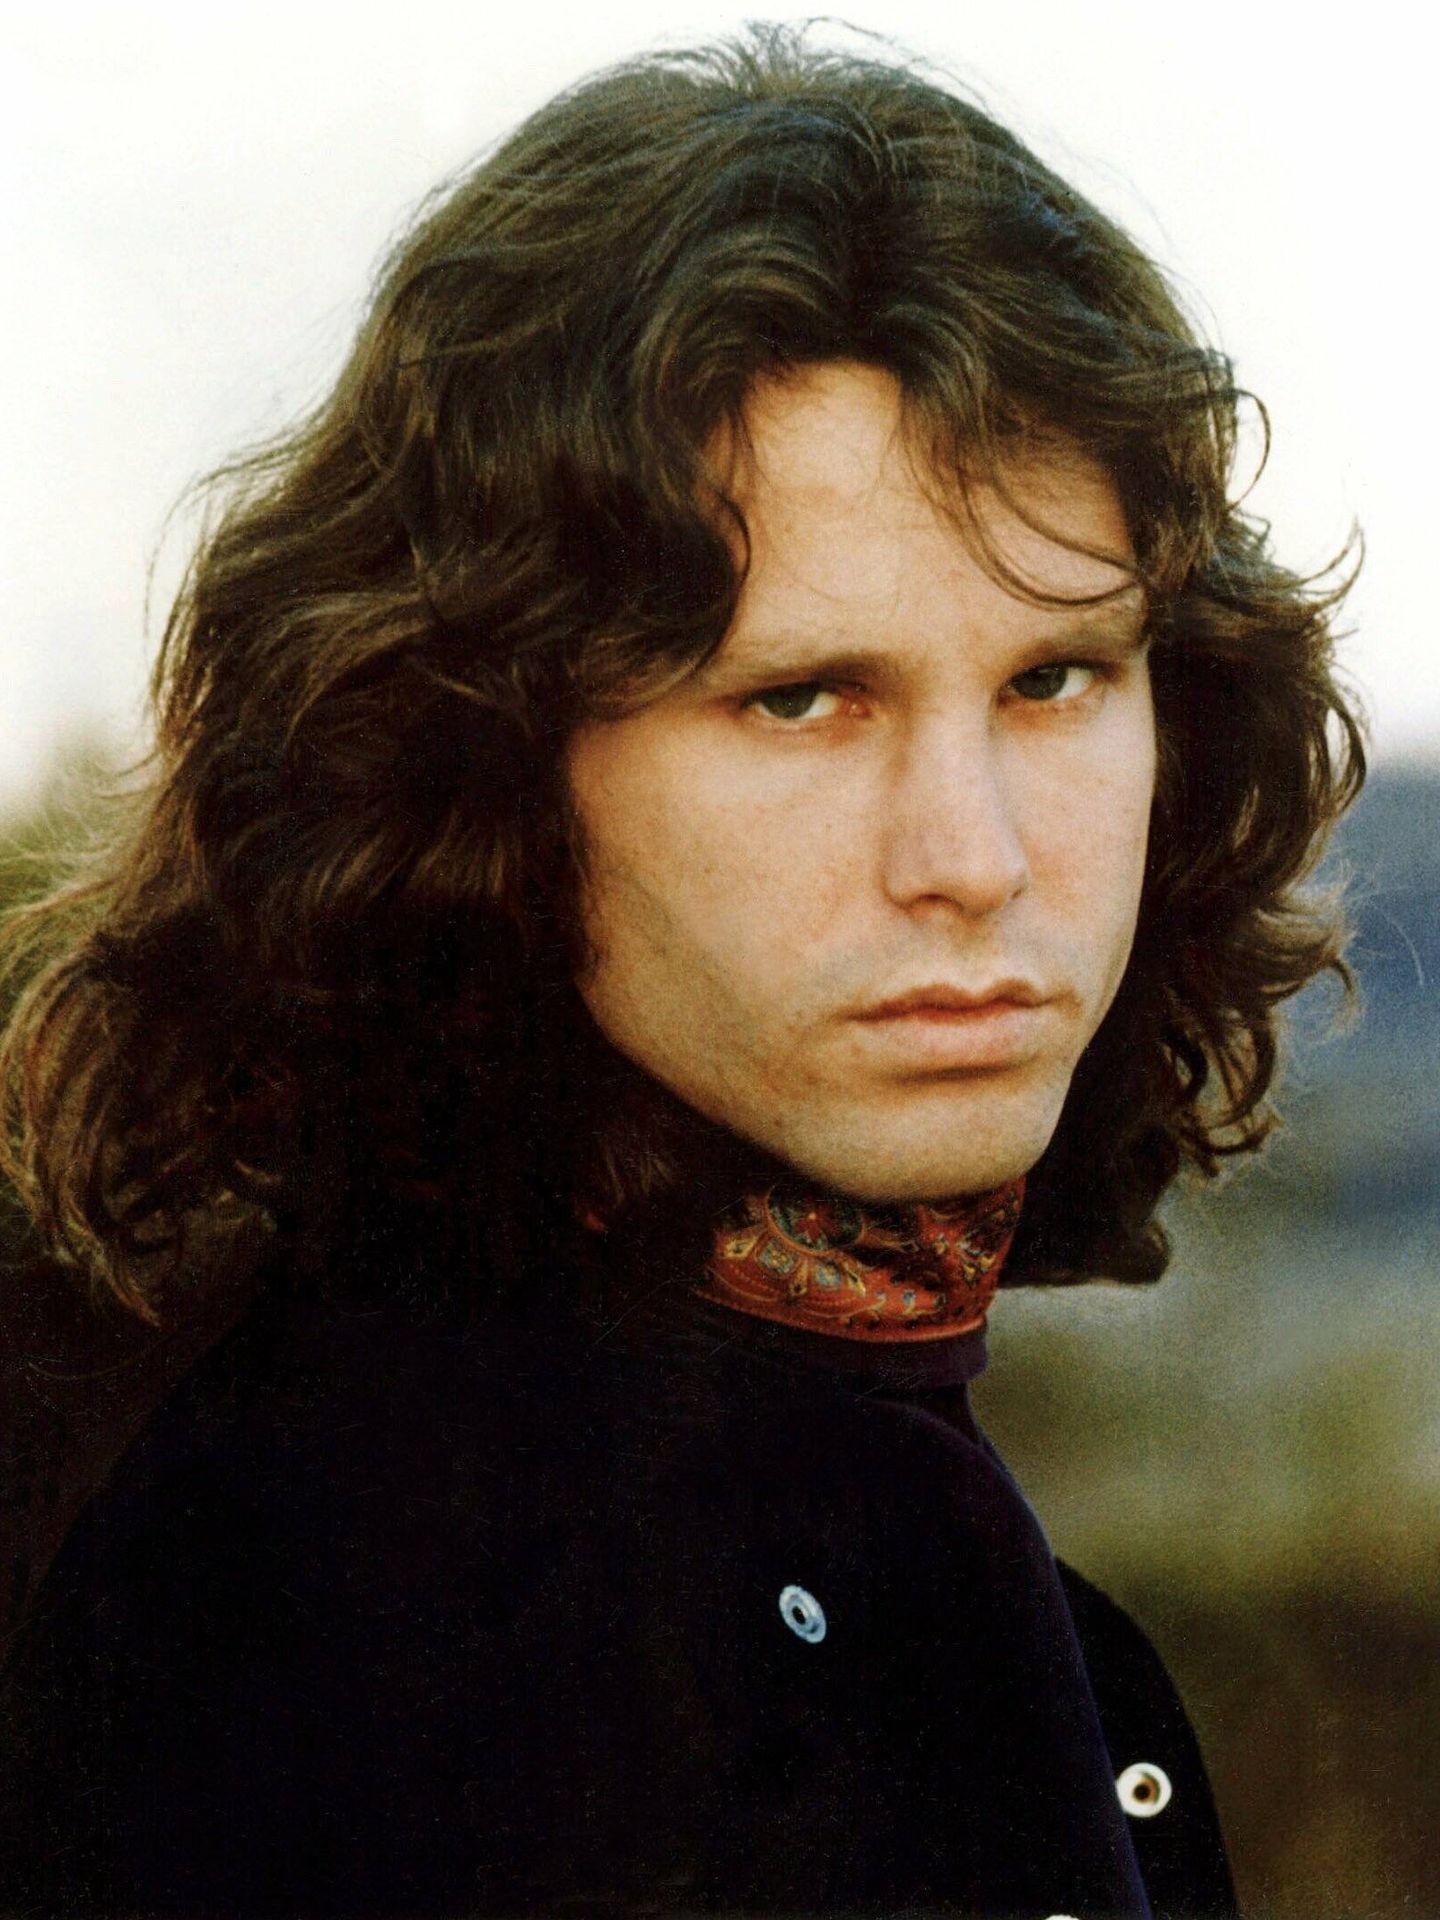 Jim Morrison, en una imagen promocional. (EFE)